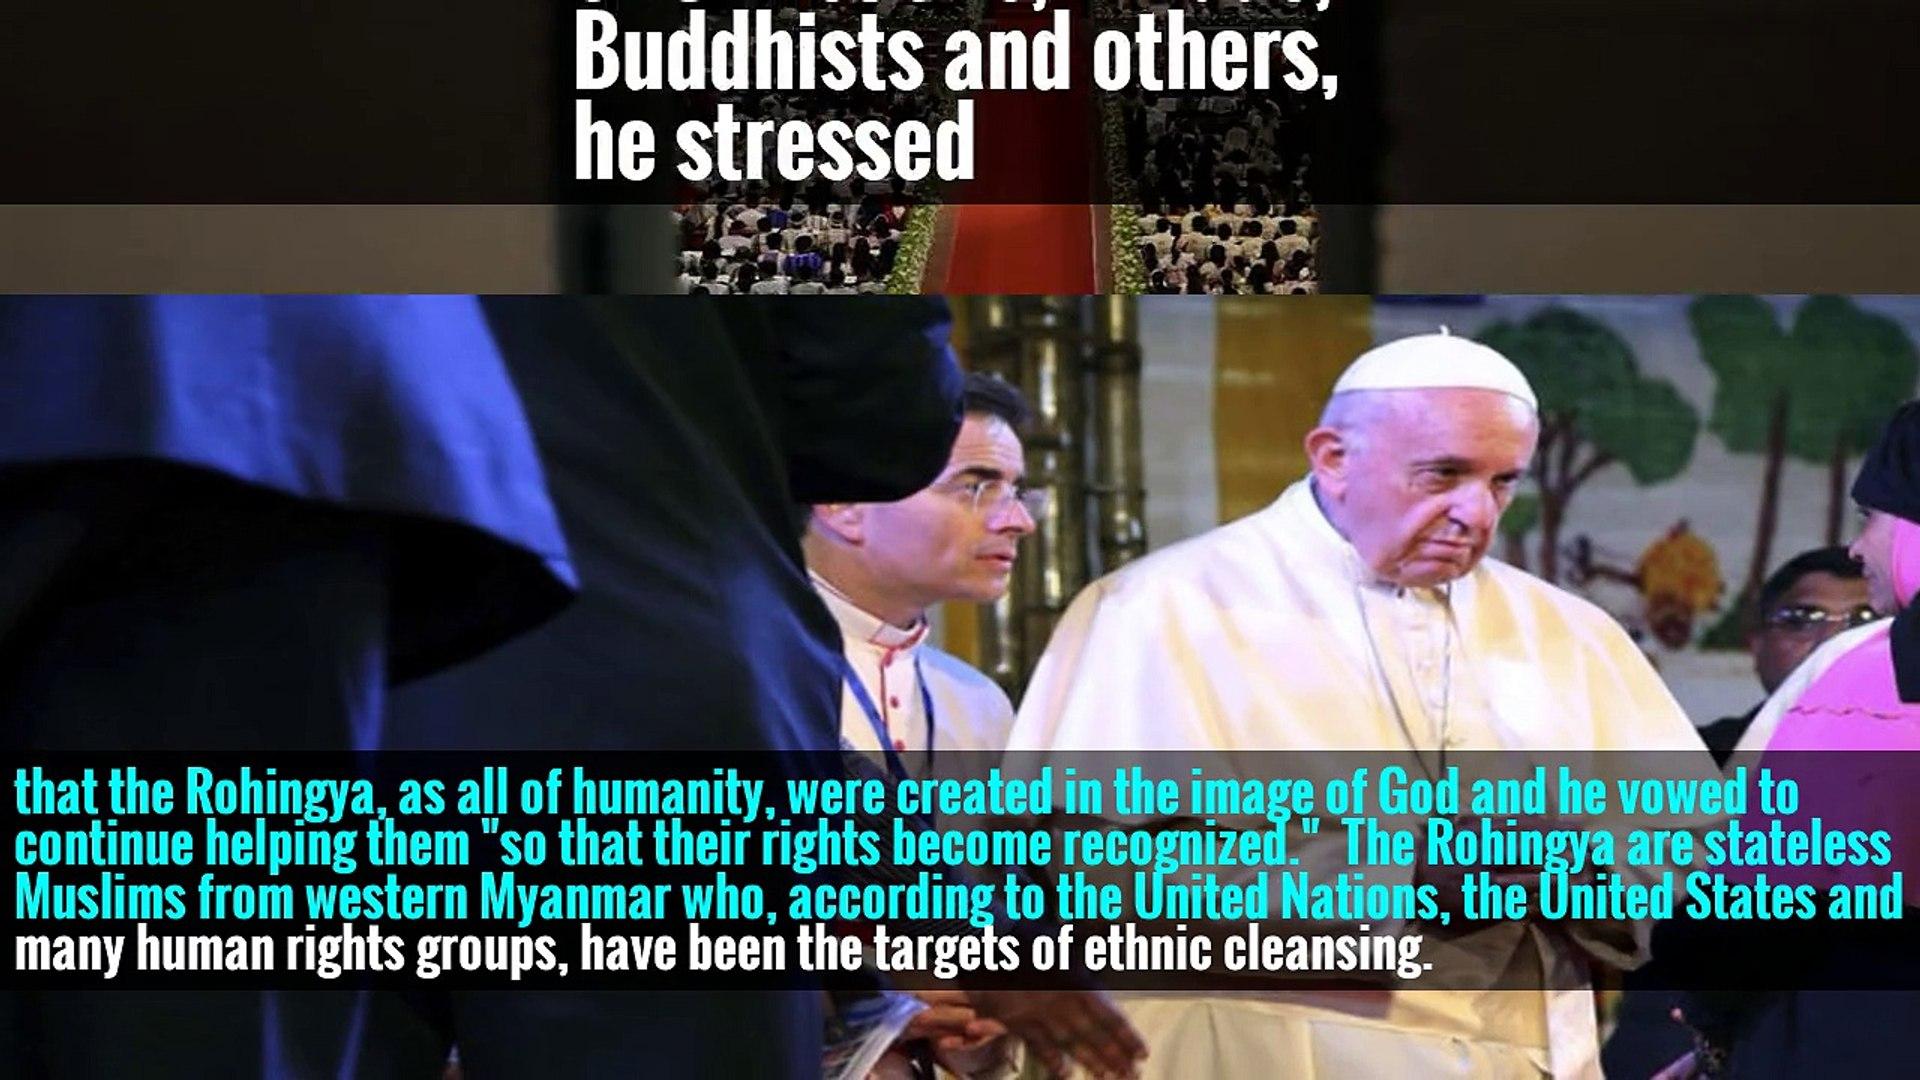 'I Ask Forgiveness,' Pope Francis Tells Rohingya Muslims in Bangladesh